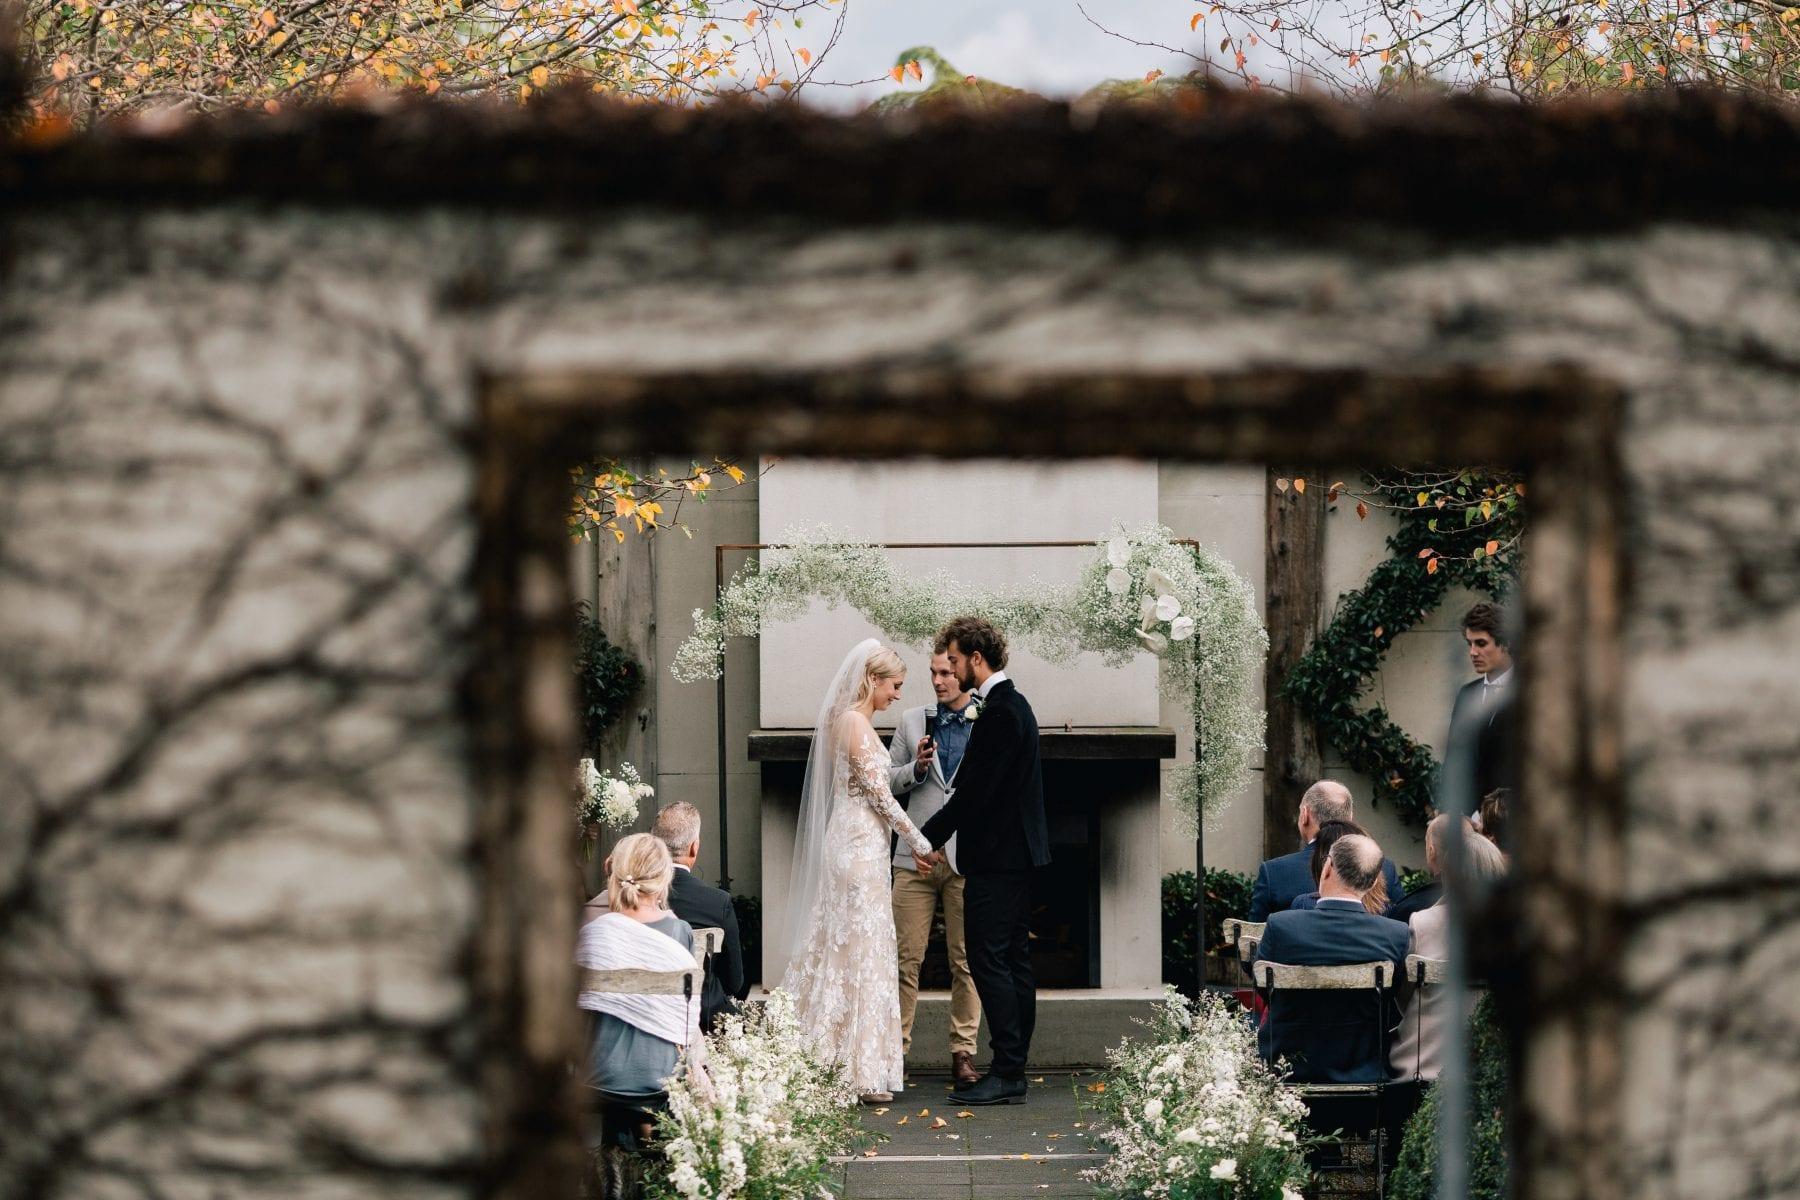 On My Hand Florist - Reuben and Hannah wedding ceremony aisle flowers